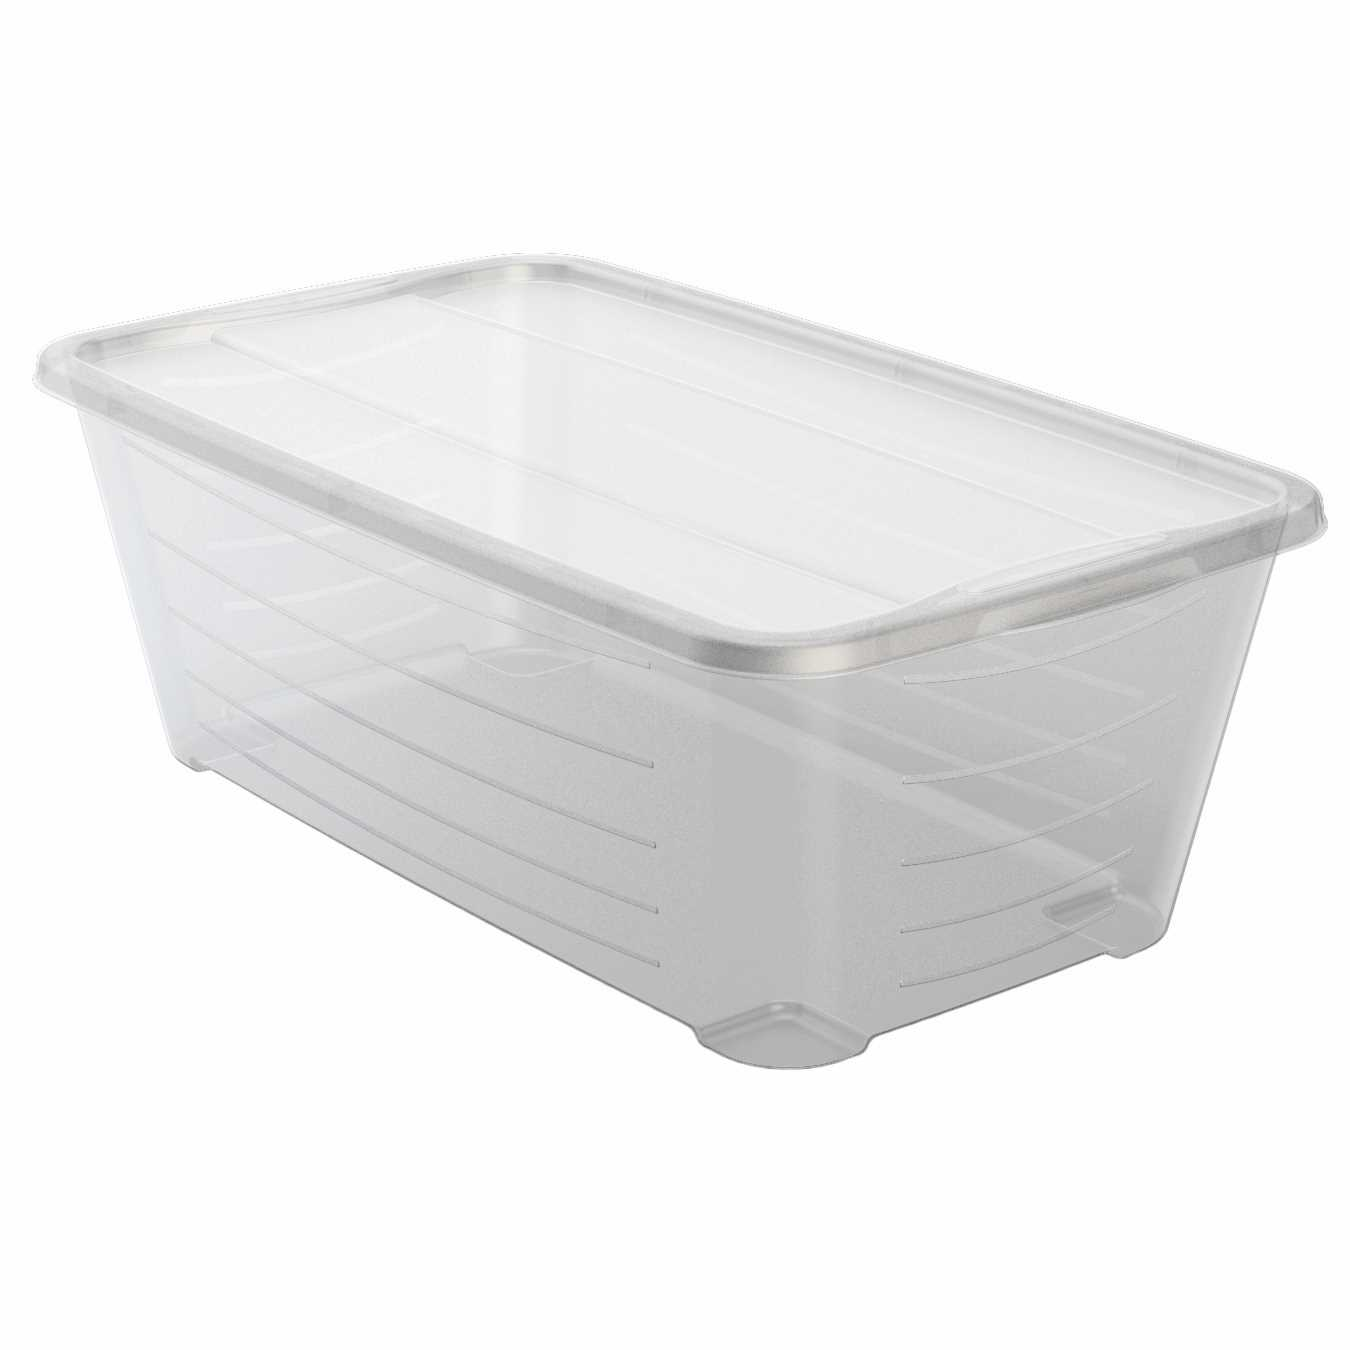 Life Story 6 Quart Rectangular Clear Plastic Storage Shoe Box, (48 Pack)